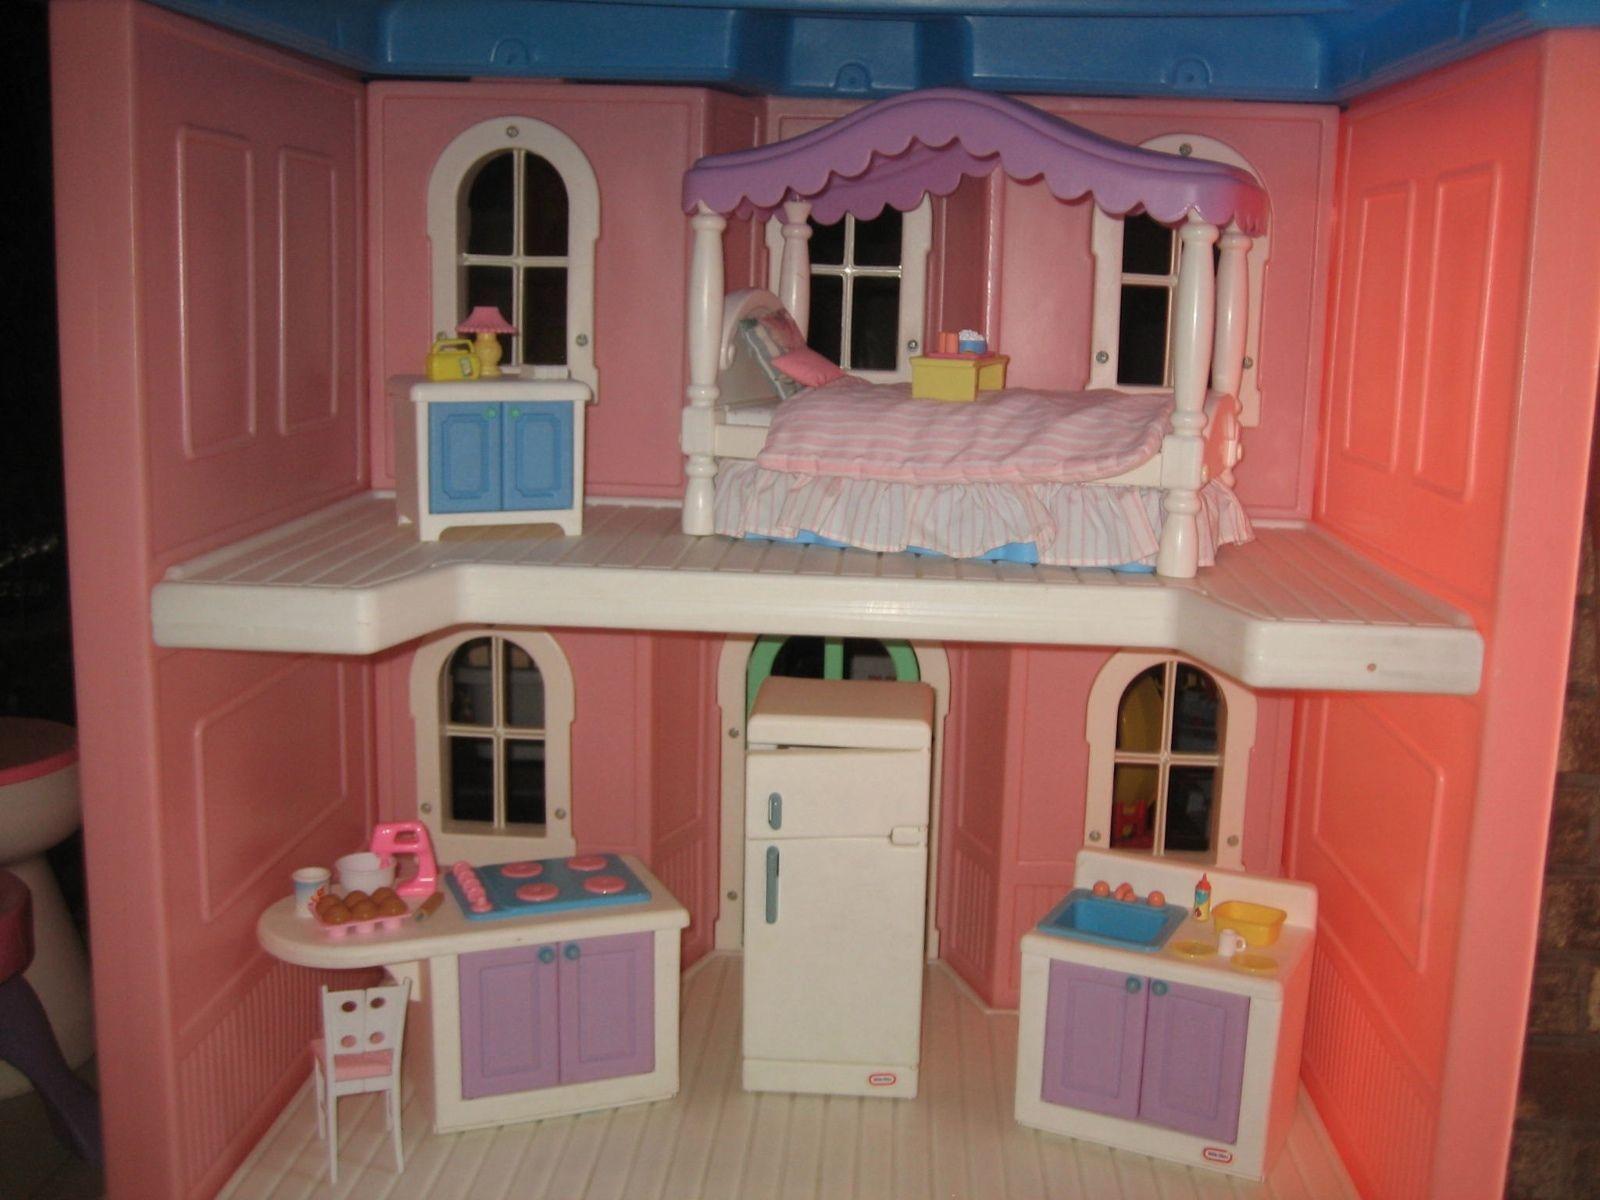 Little Tikes Barbie House 1990s Novocom Top